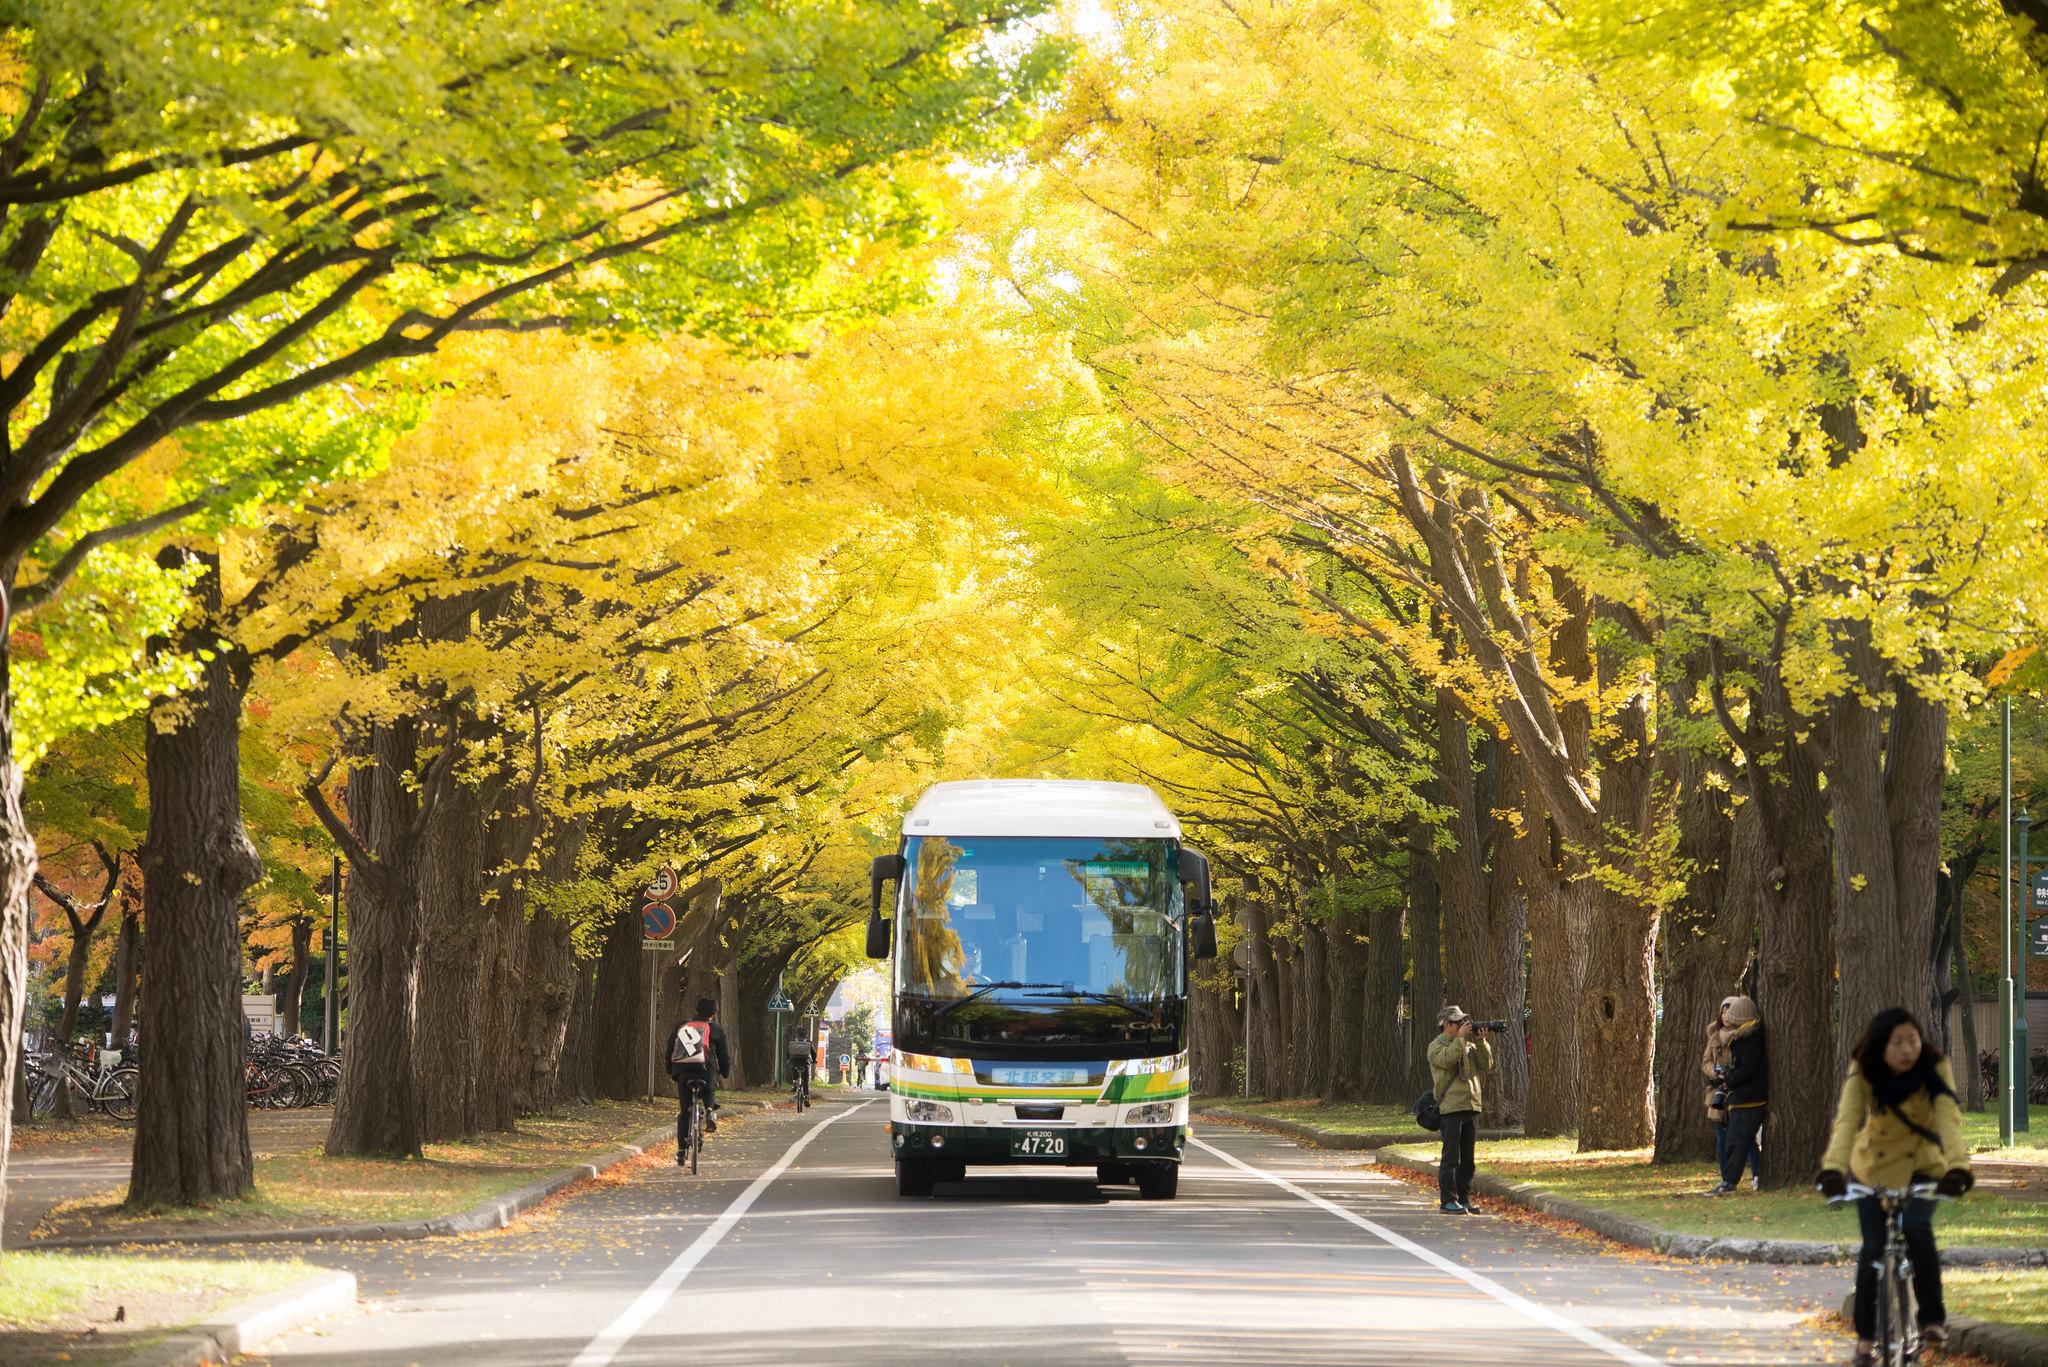 10 Things to do in Sapporo, Hokkaido, Japan 07